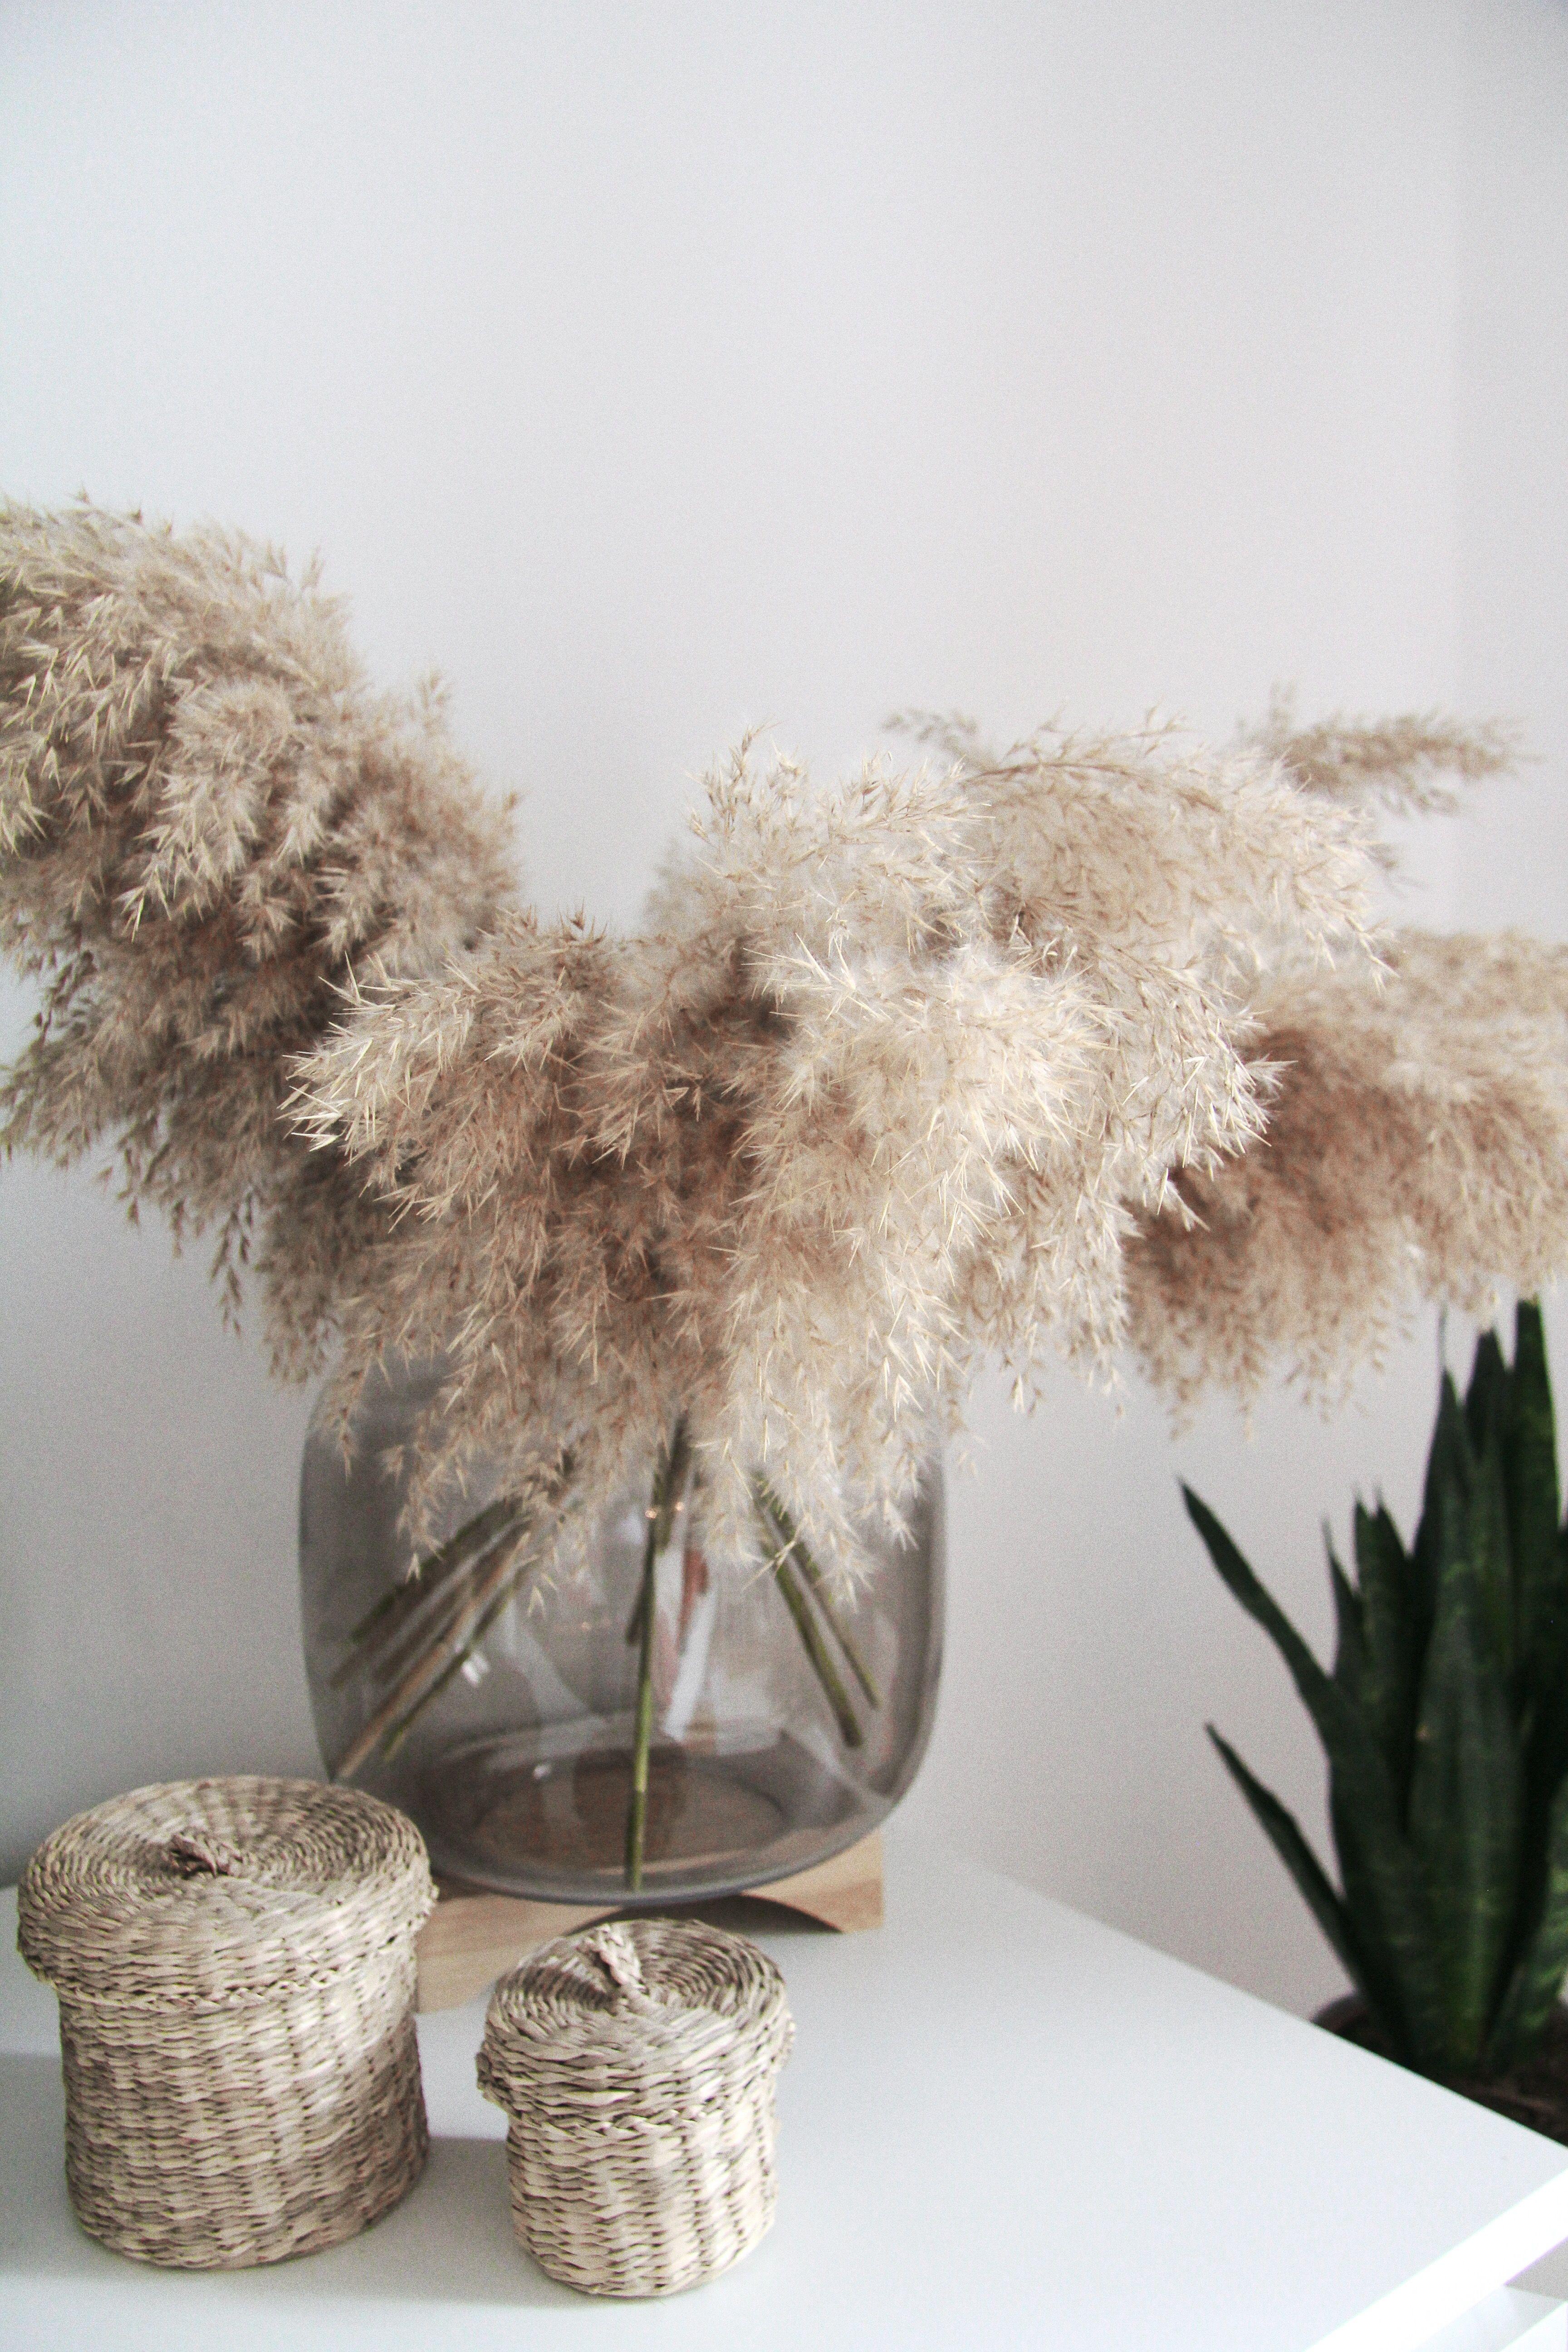 Inspiration Pampasgras Als Deko Deko Blumen Gestecke